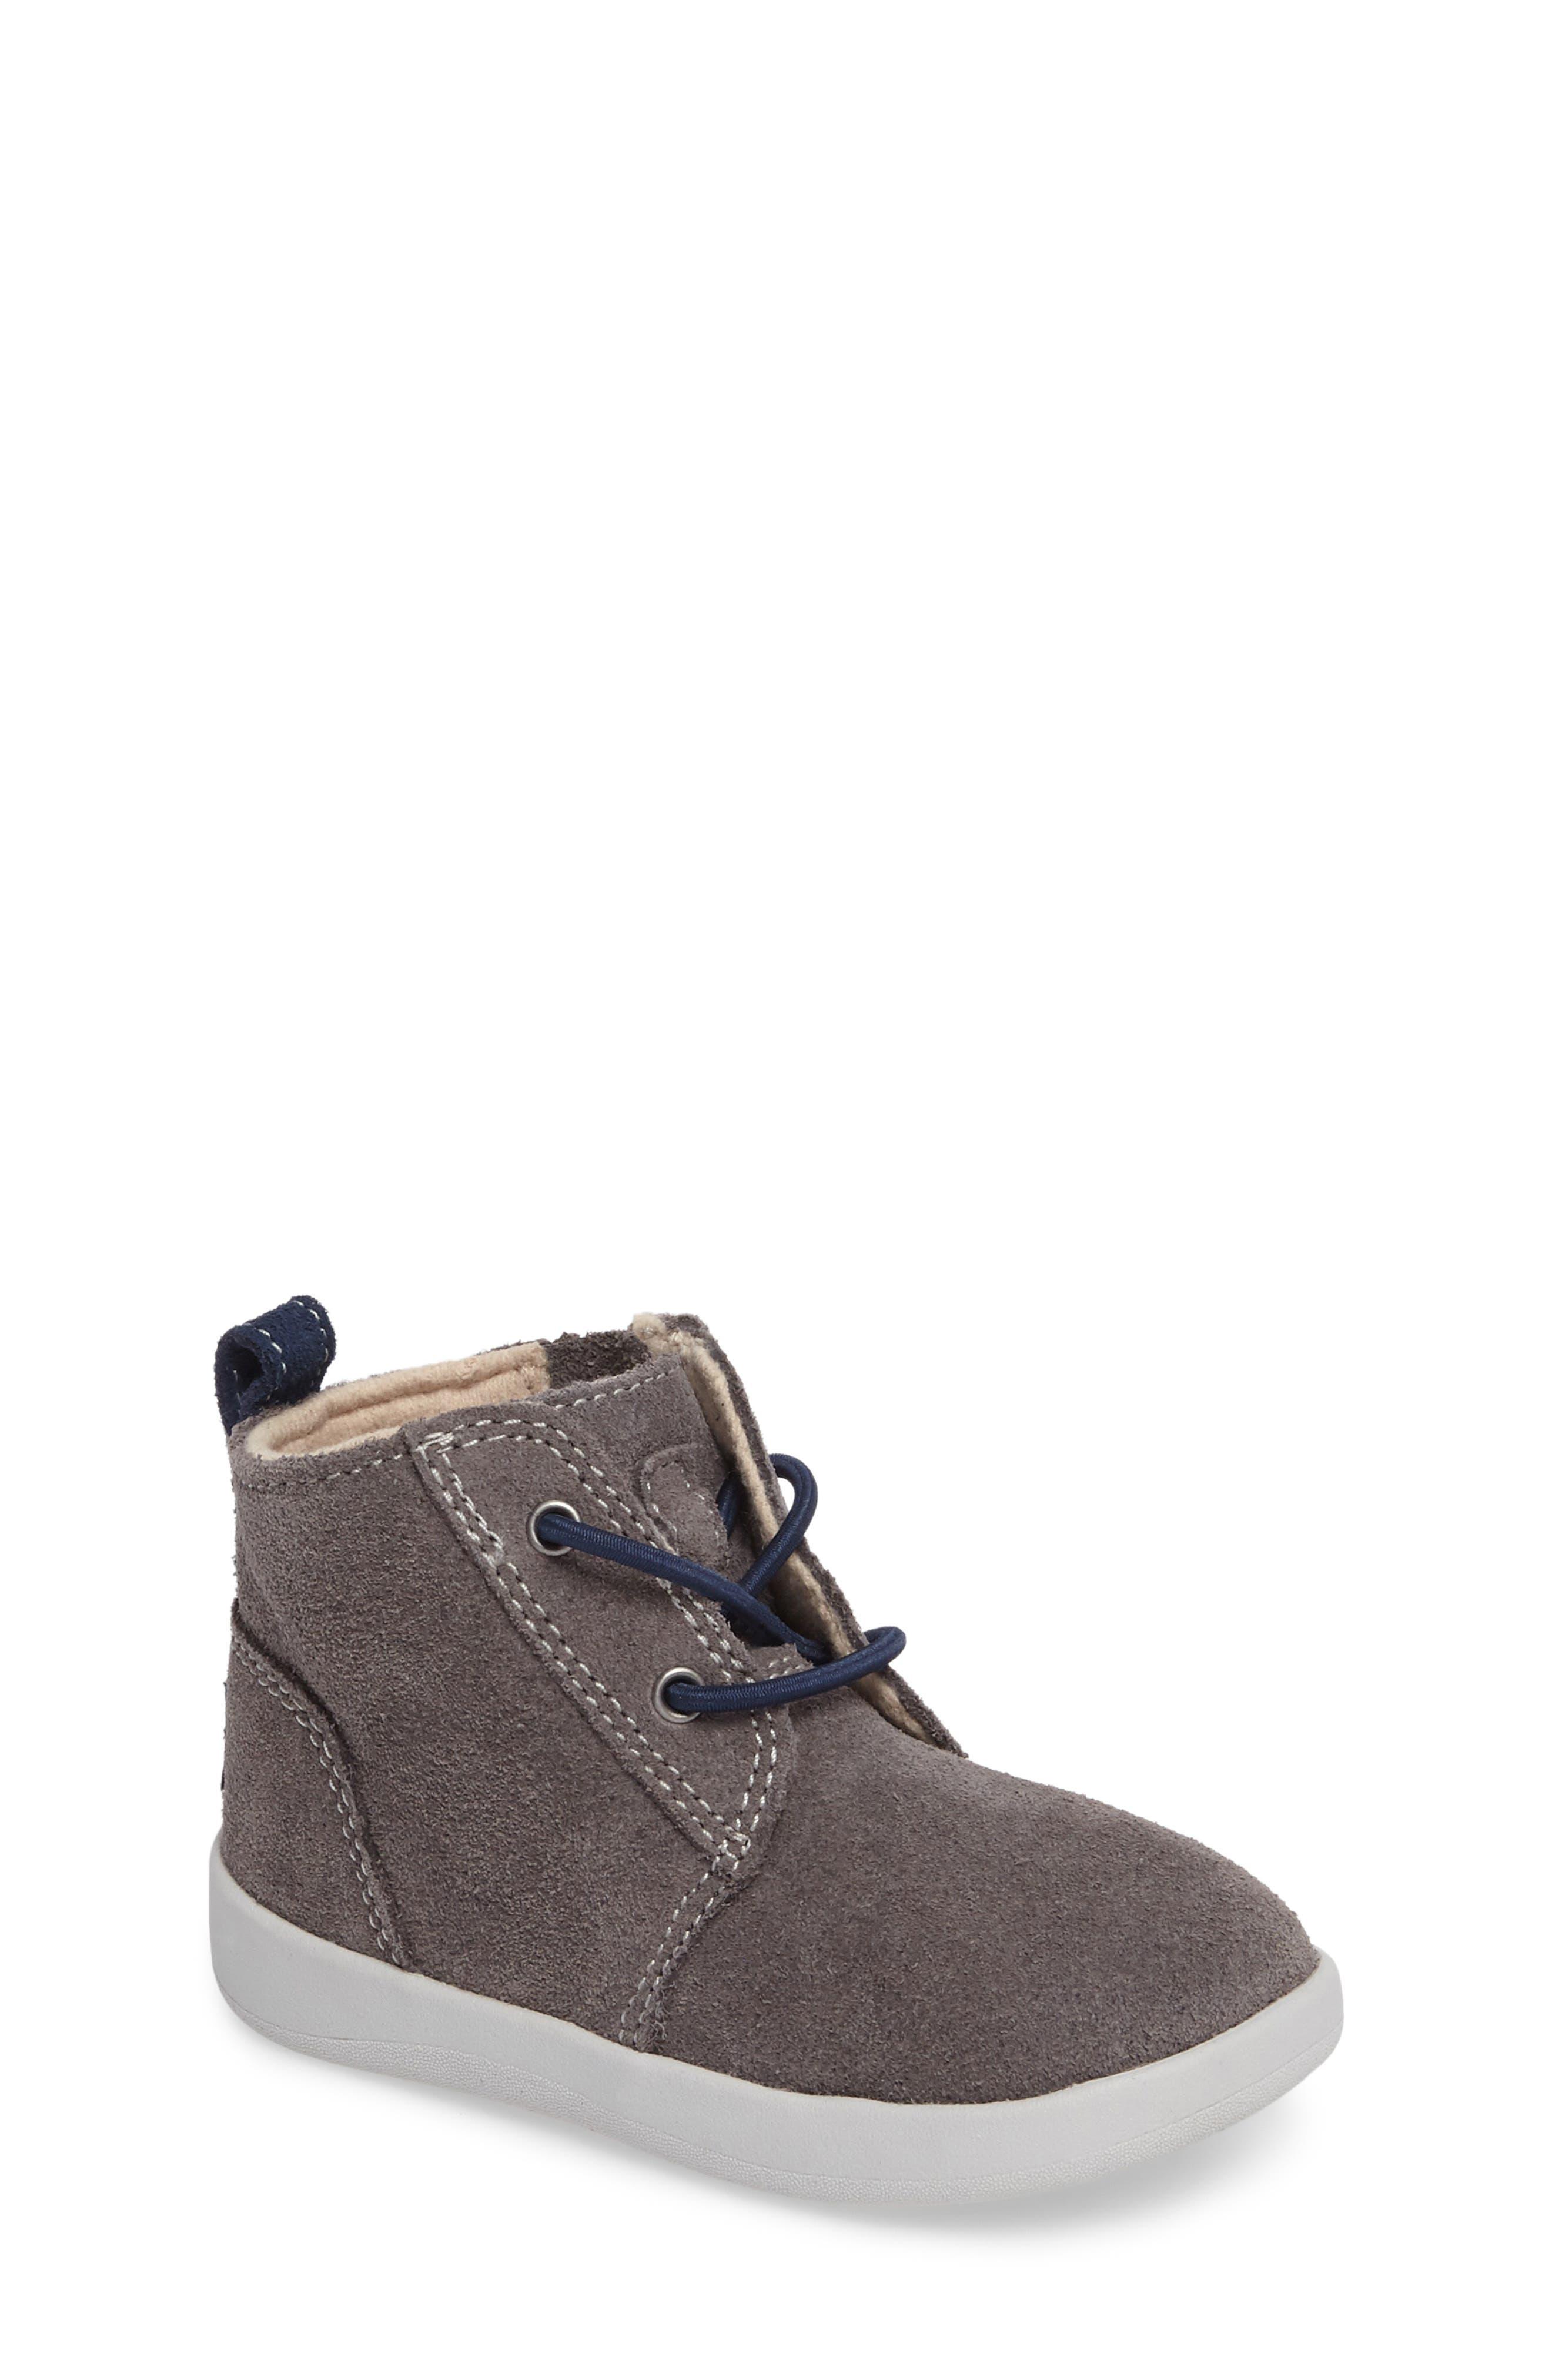 UGG® Kristjan Chukka Bootie Sneaker (Baby, Walker & Toddler)